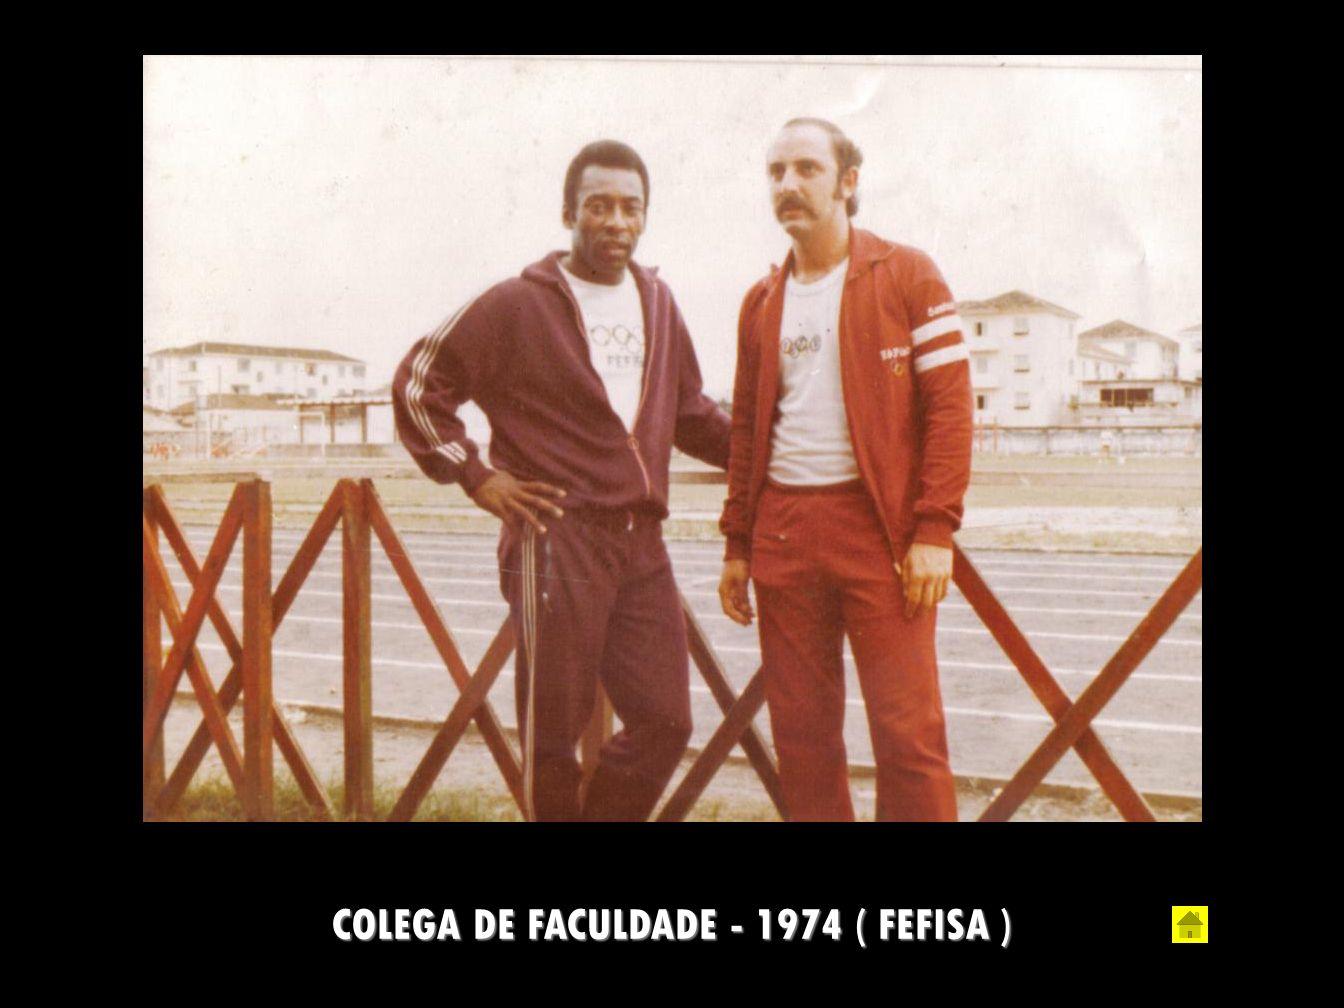 COLEGA DE FACULDADE - 1974 ( FEFISA )